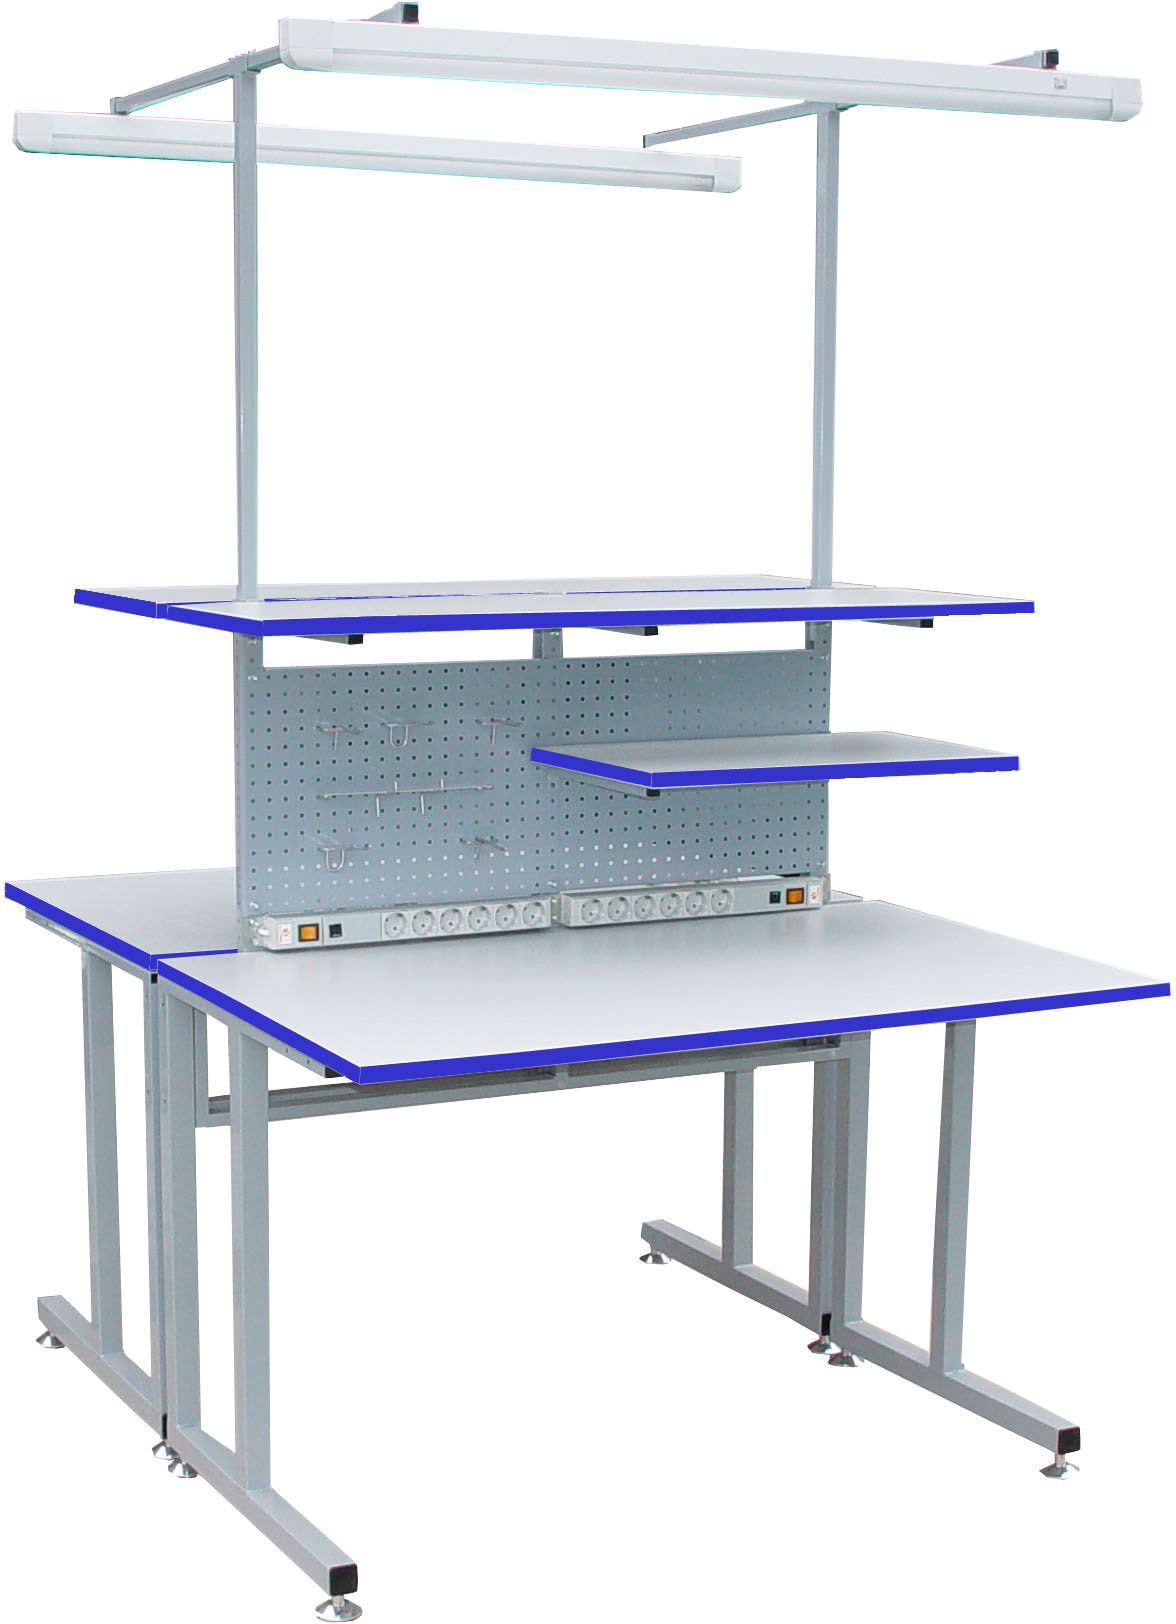 Стол рабочий антистатический С5-1500х650 Р островной ESD, фото 2